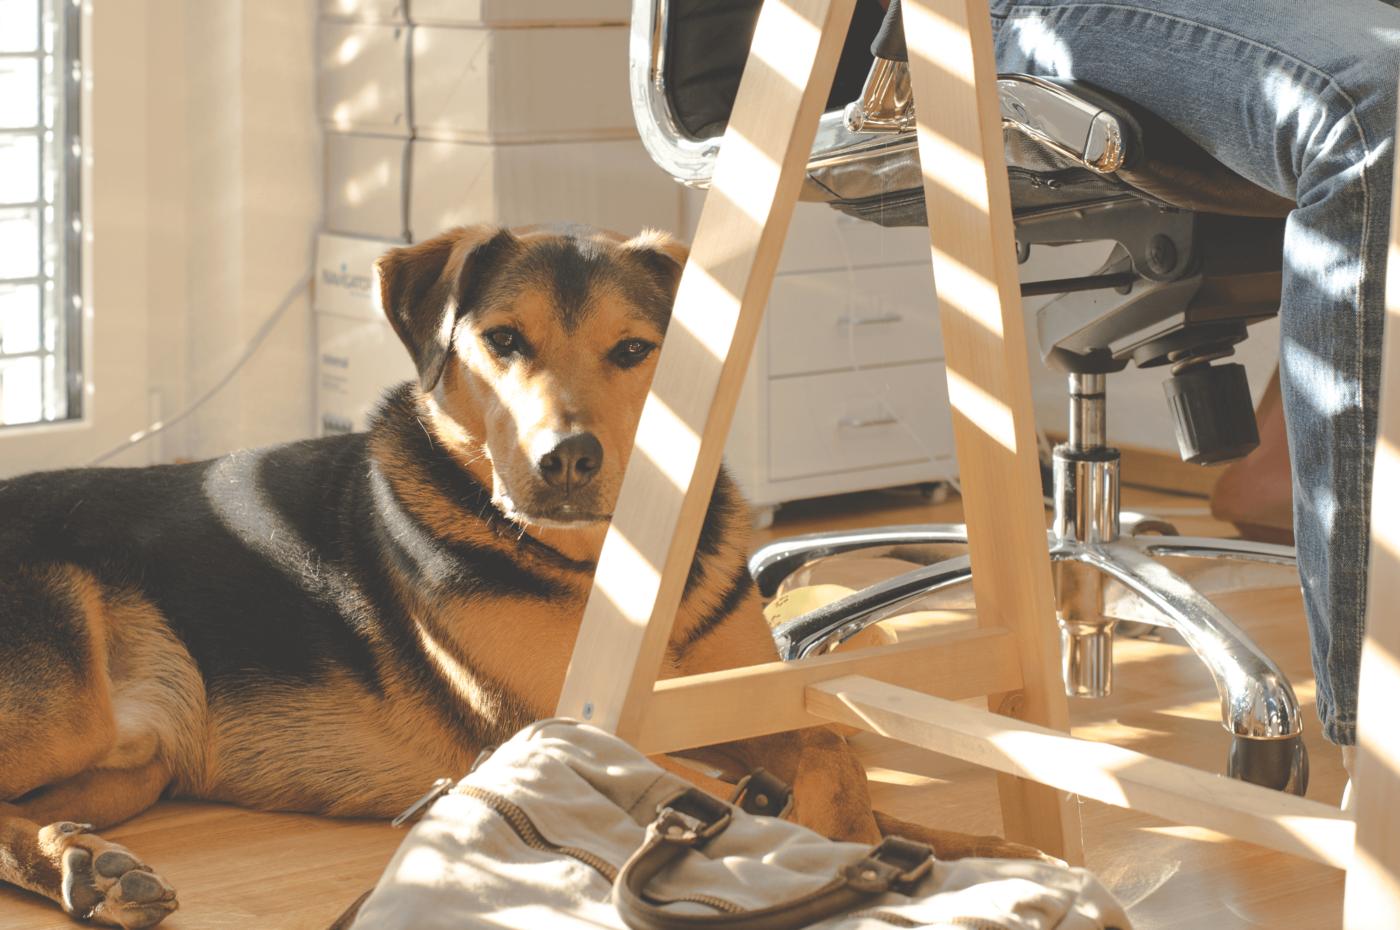 pet-at-work-1